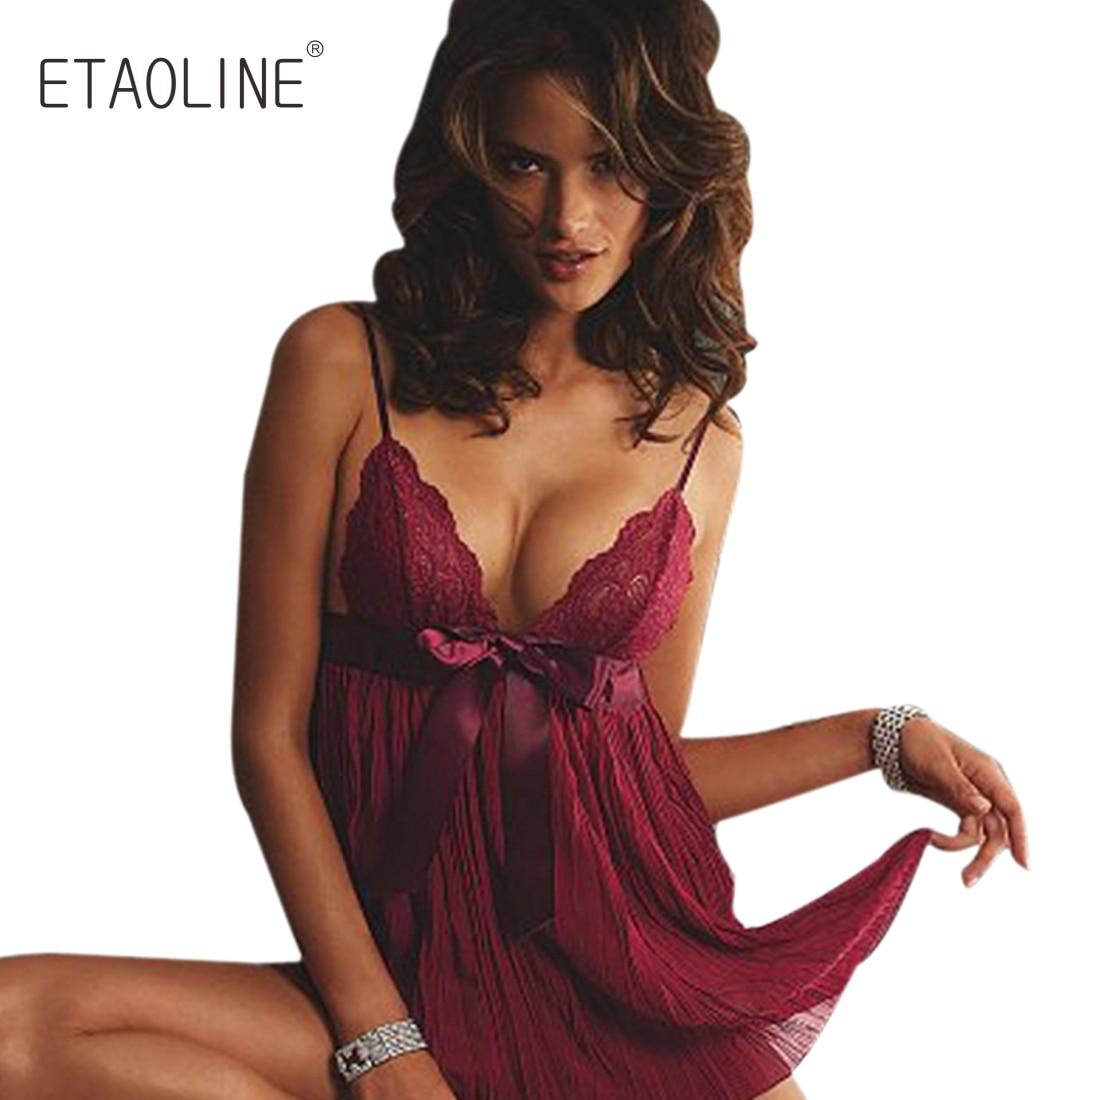 f18b5044cdc ETAOLINE 2018 New Women Girl Sexy Lingerie Nightwear Underwear Nightgrown  Sleepwear Lace BabyDoll Dress Women s Sleepshirts -in Nightgowns    Sleepshirts ...